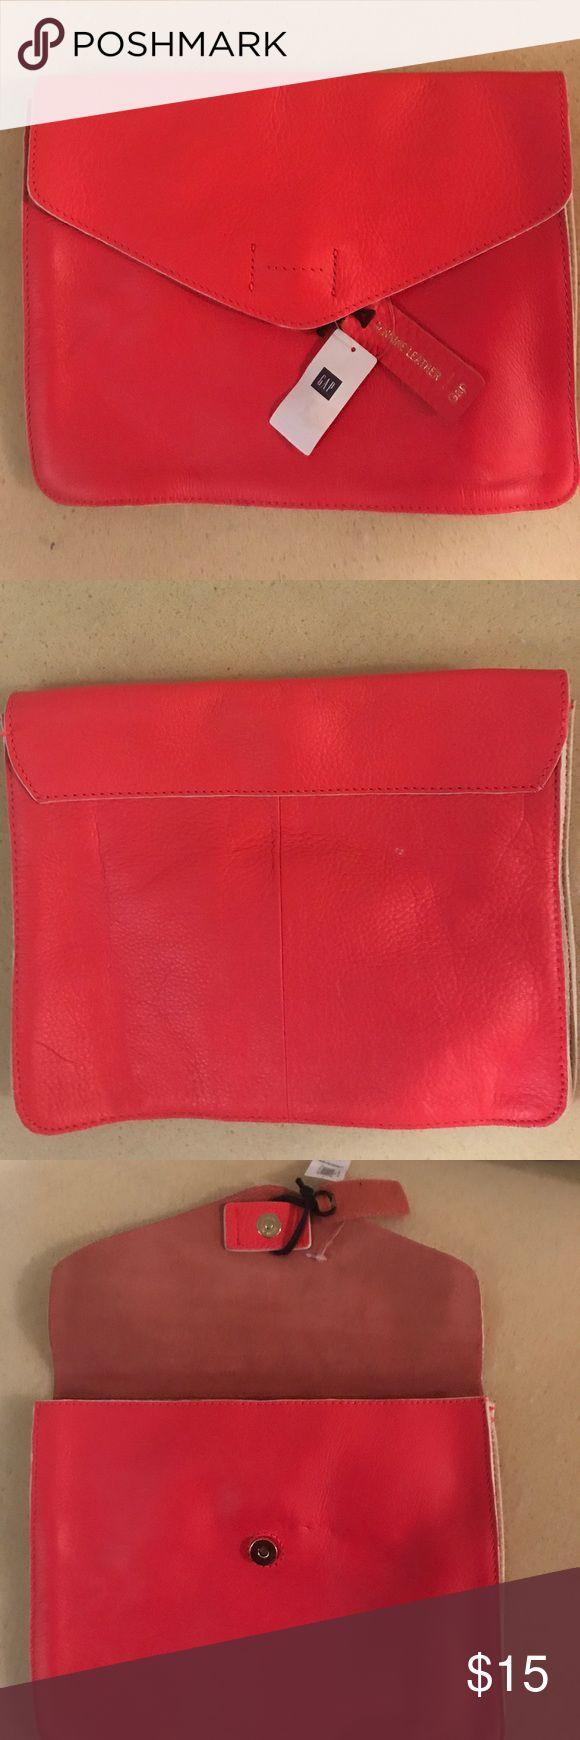 Leather clutch Gap pretty Red/Orange all leather brand new clutch. GAP Bags Clutches & Wristlets